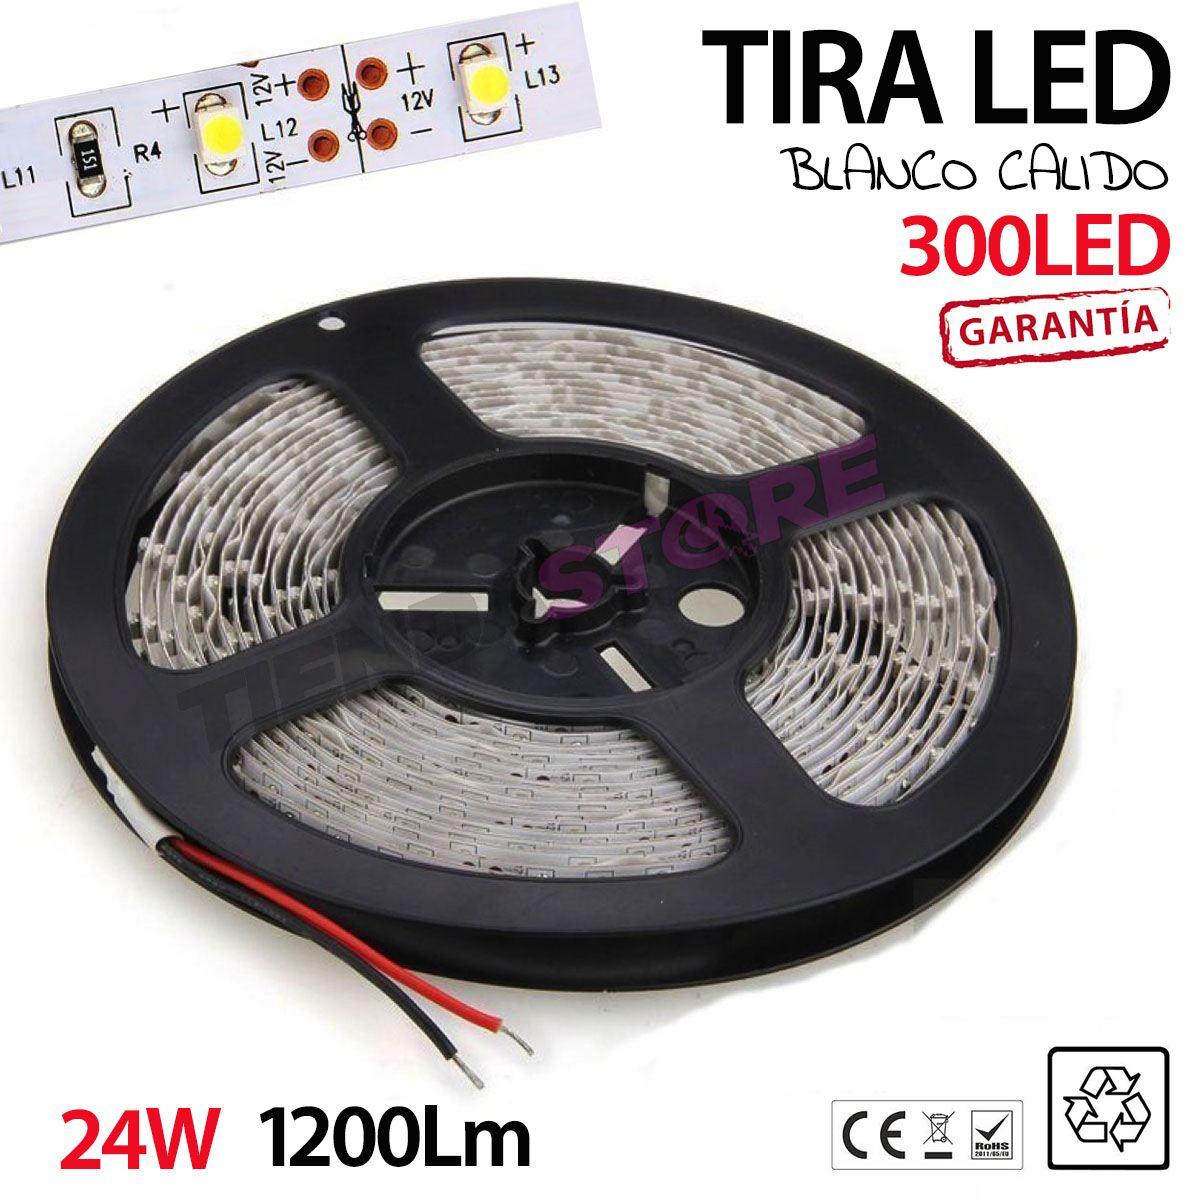 Tiras de luces led 5 metros 3528 blanco rollo led blanco - Tiras luces led ...